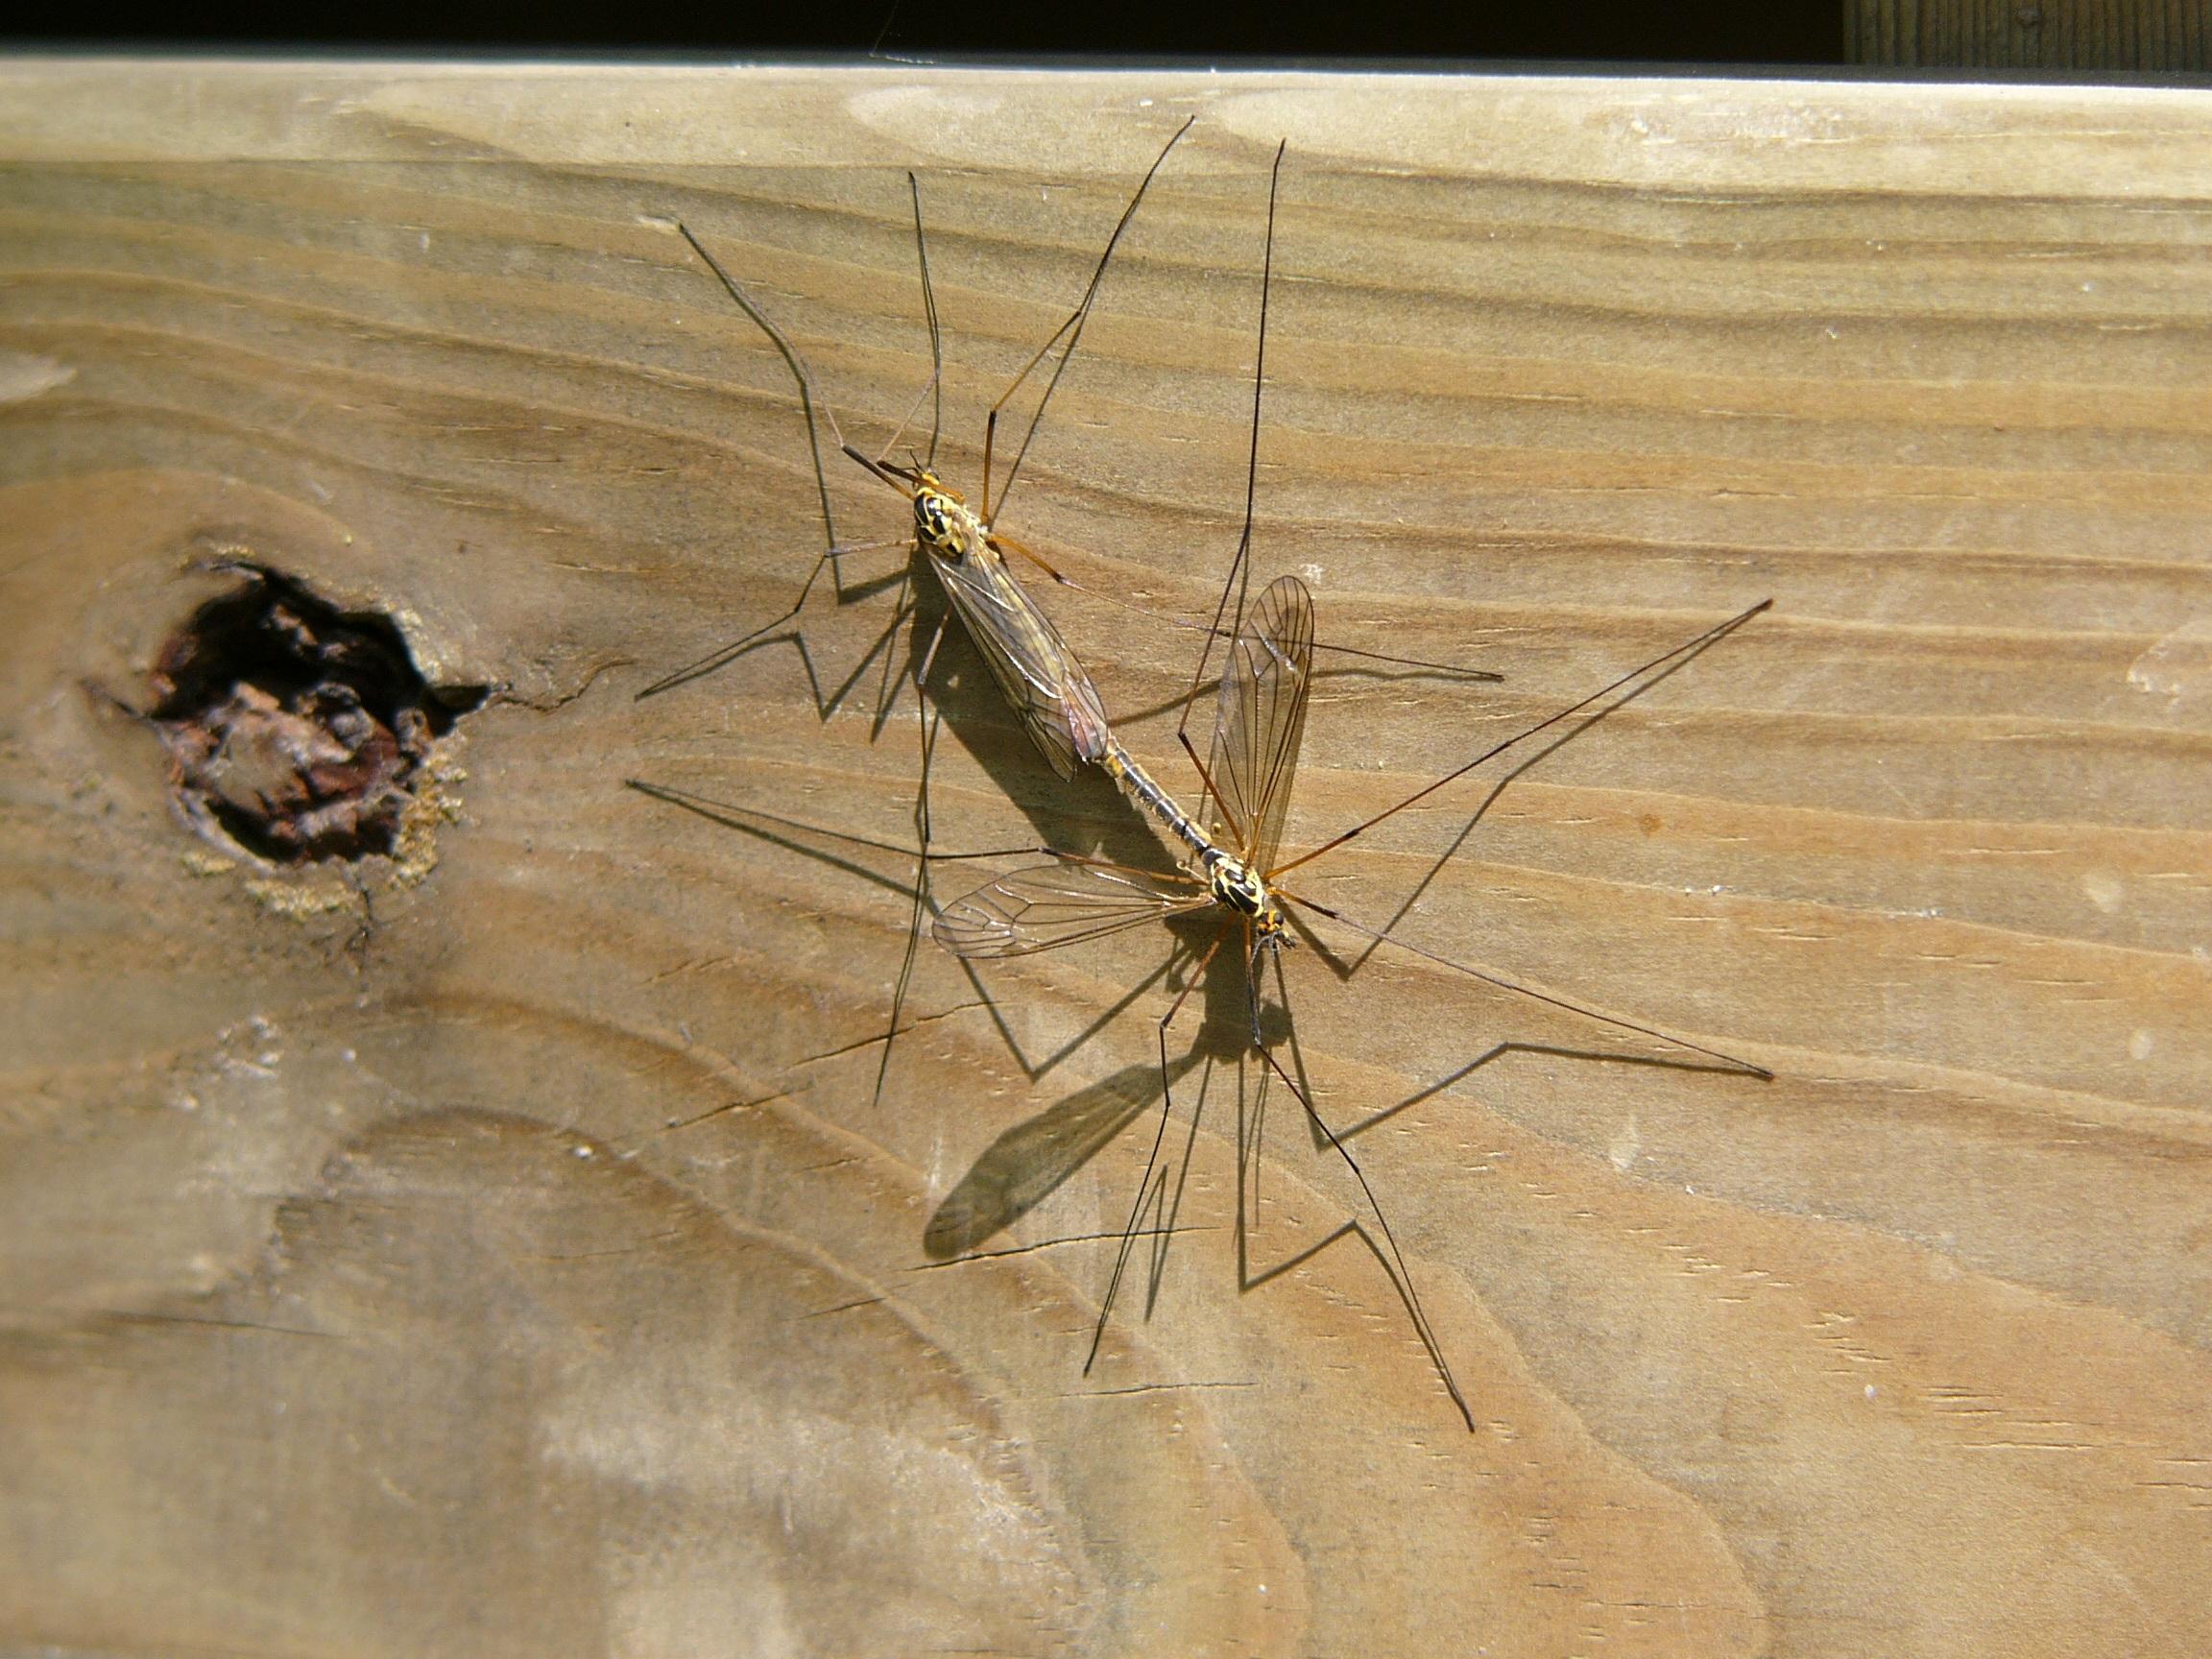 Kostenlose foto : Natur, Flügel, Holz, Liebe, Insekt, Paar, Fauna ...